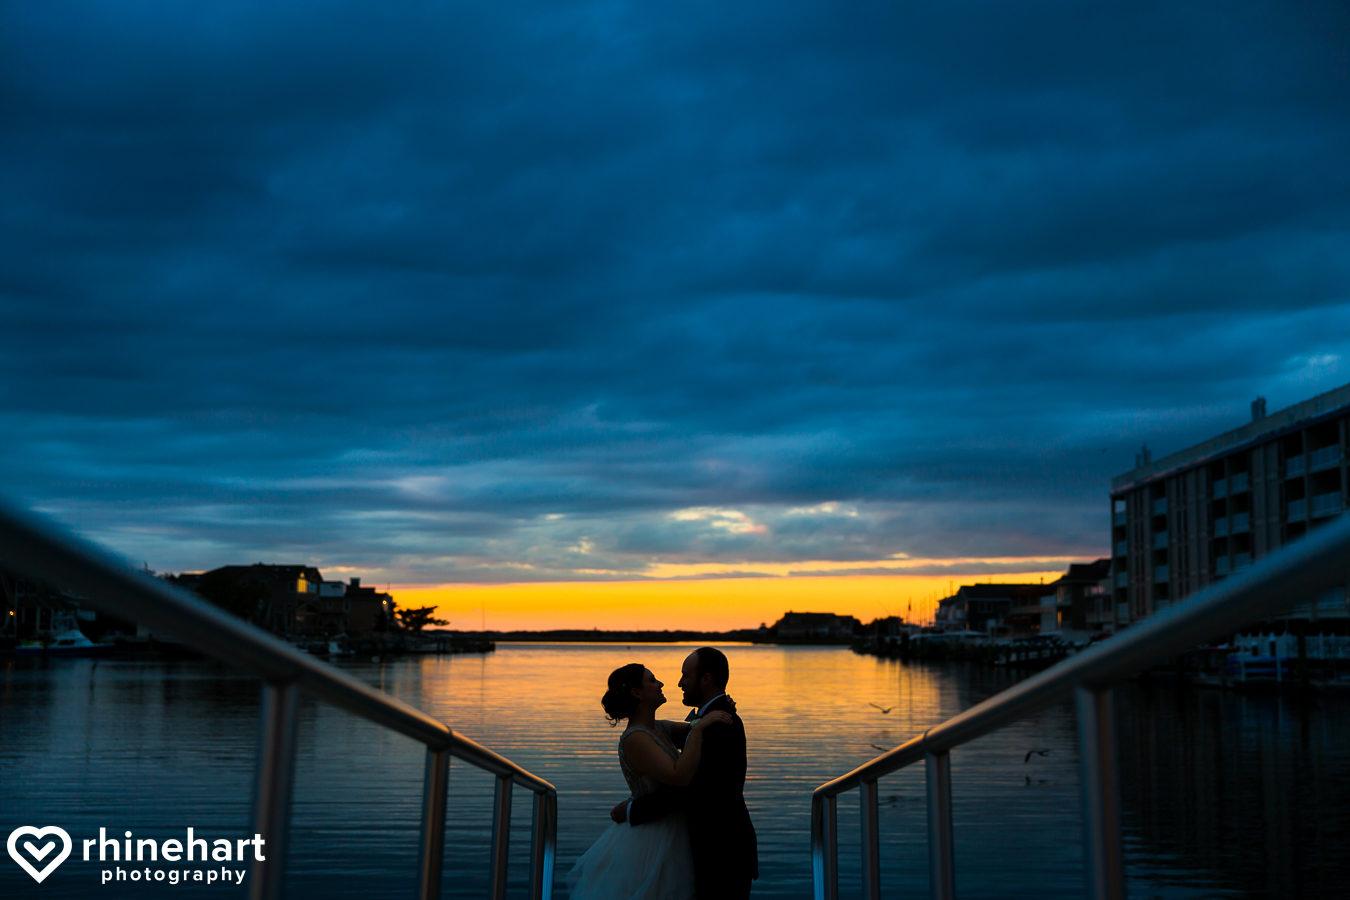 reeds-stone-harbor-best-wedding-photographers-unique-creative-artistic-authentic-461